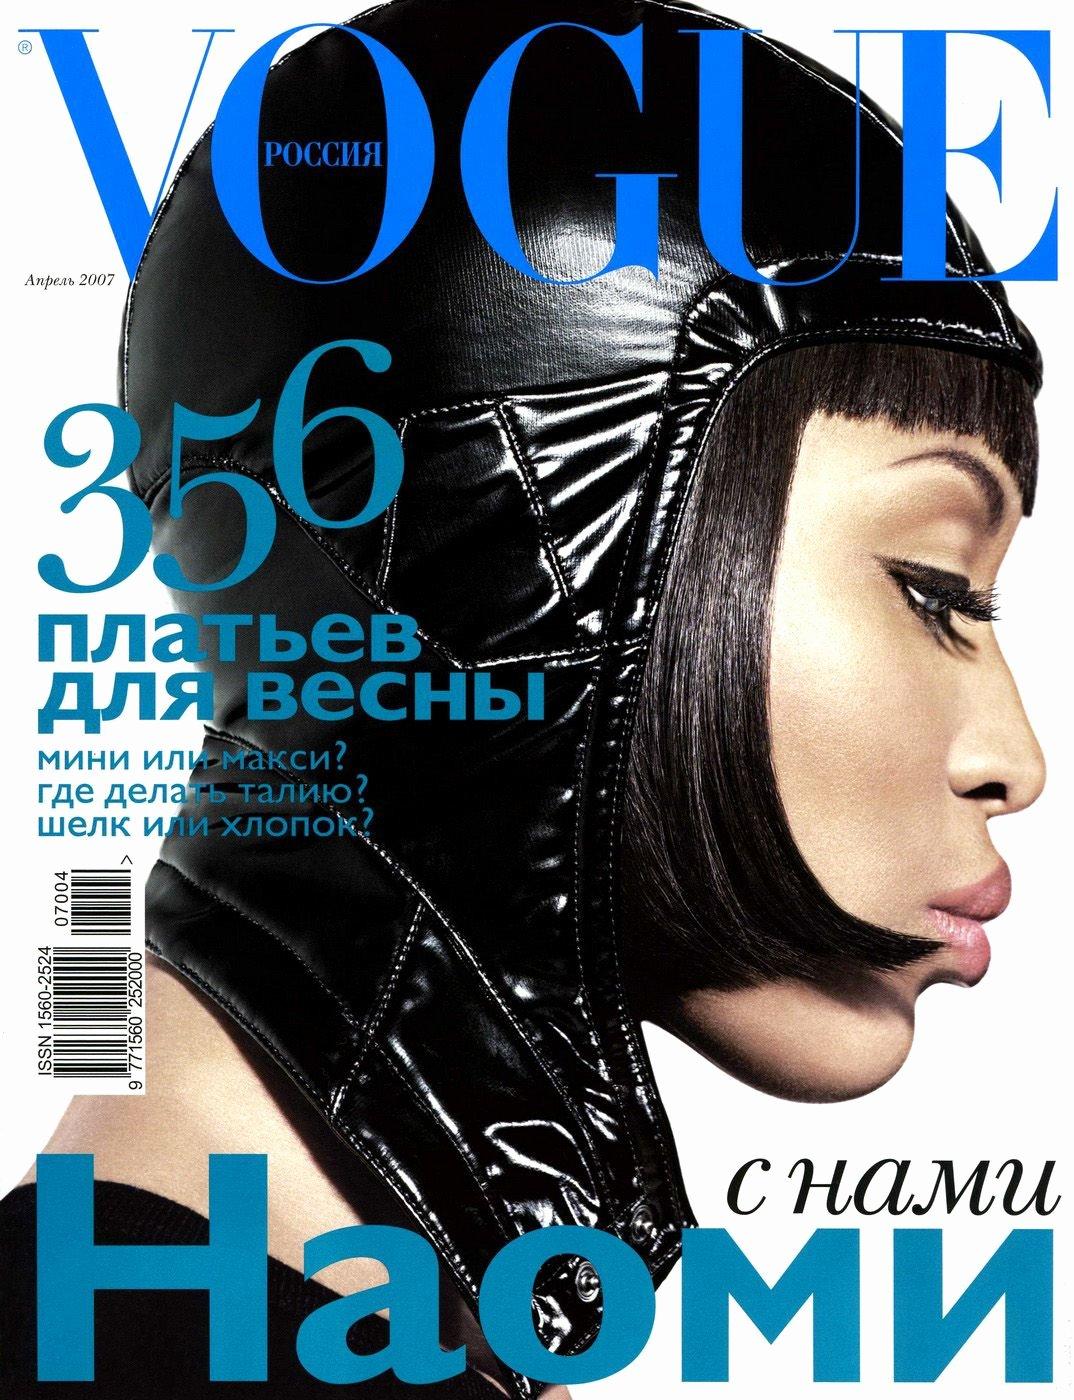 Vogue Magazine Cover Template Unique Naomi Campbell